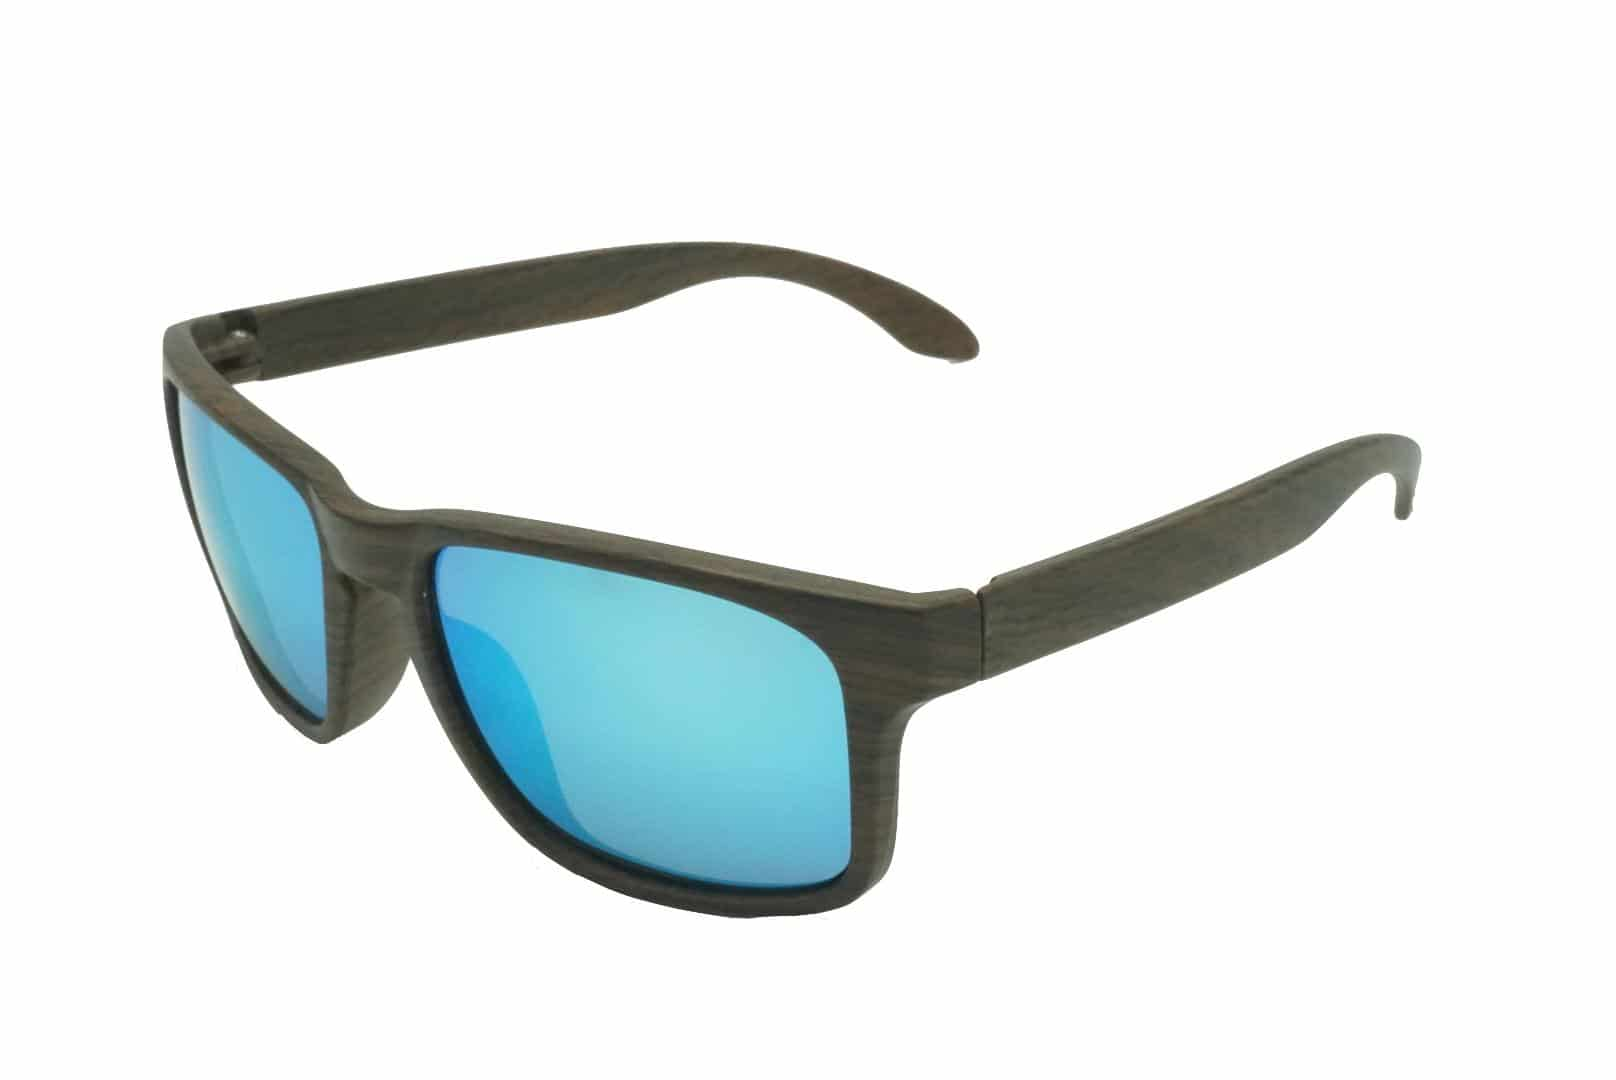 4Goodz Barcelona blue - houtlook zonnebril - blauw spiegelglas